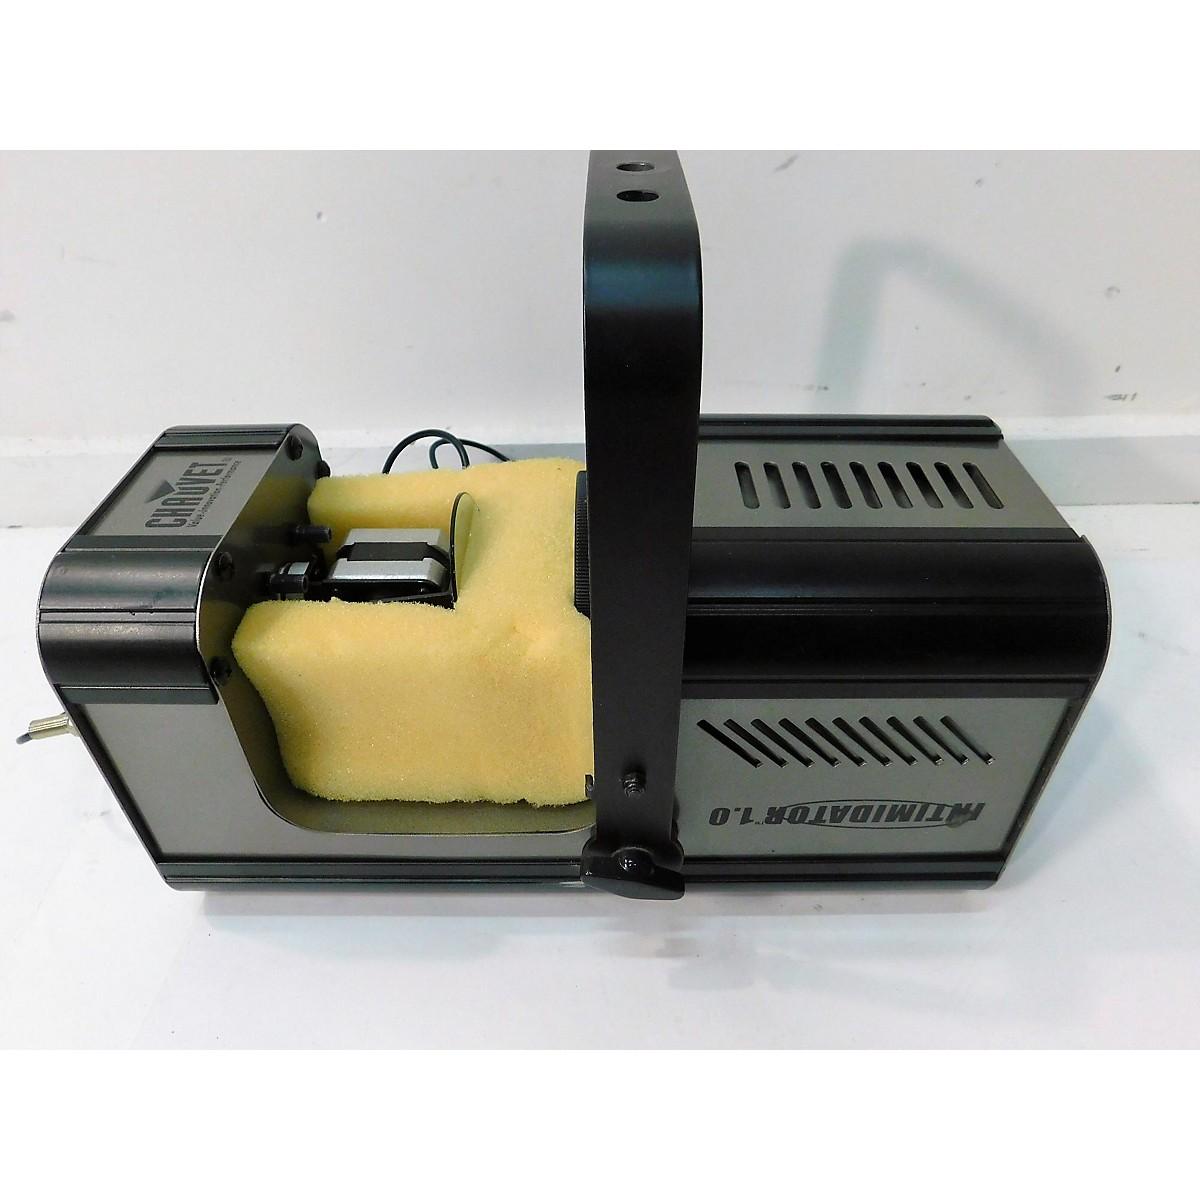 CHAUVET DJ Intimidator 1.0 DMX Intelligent Lighting